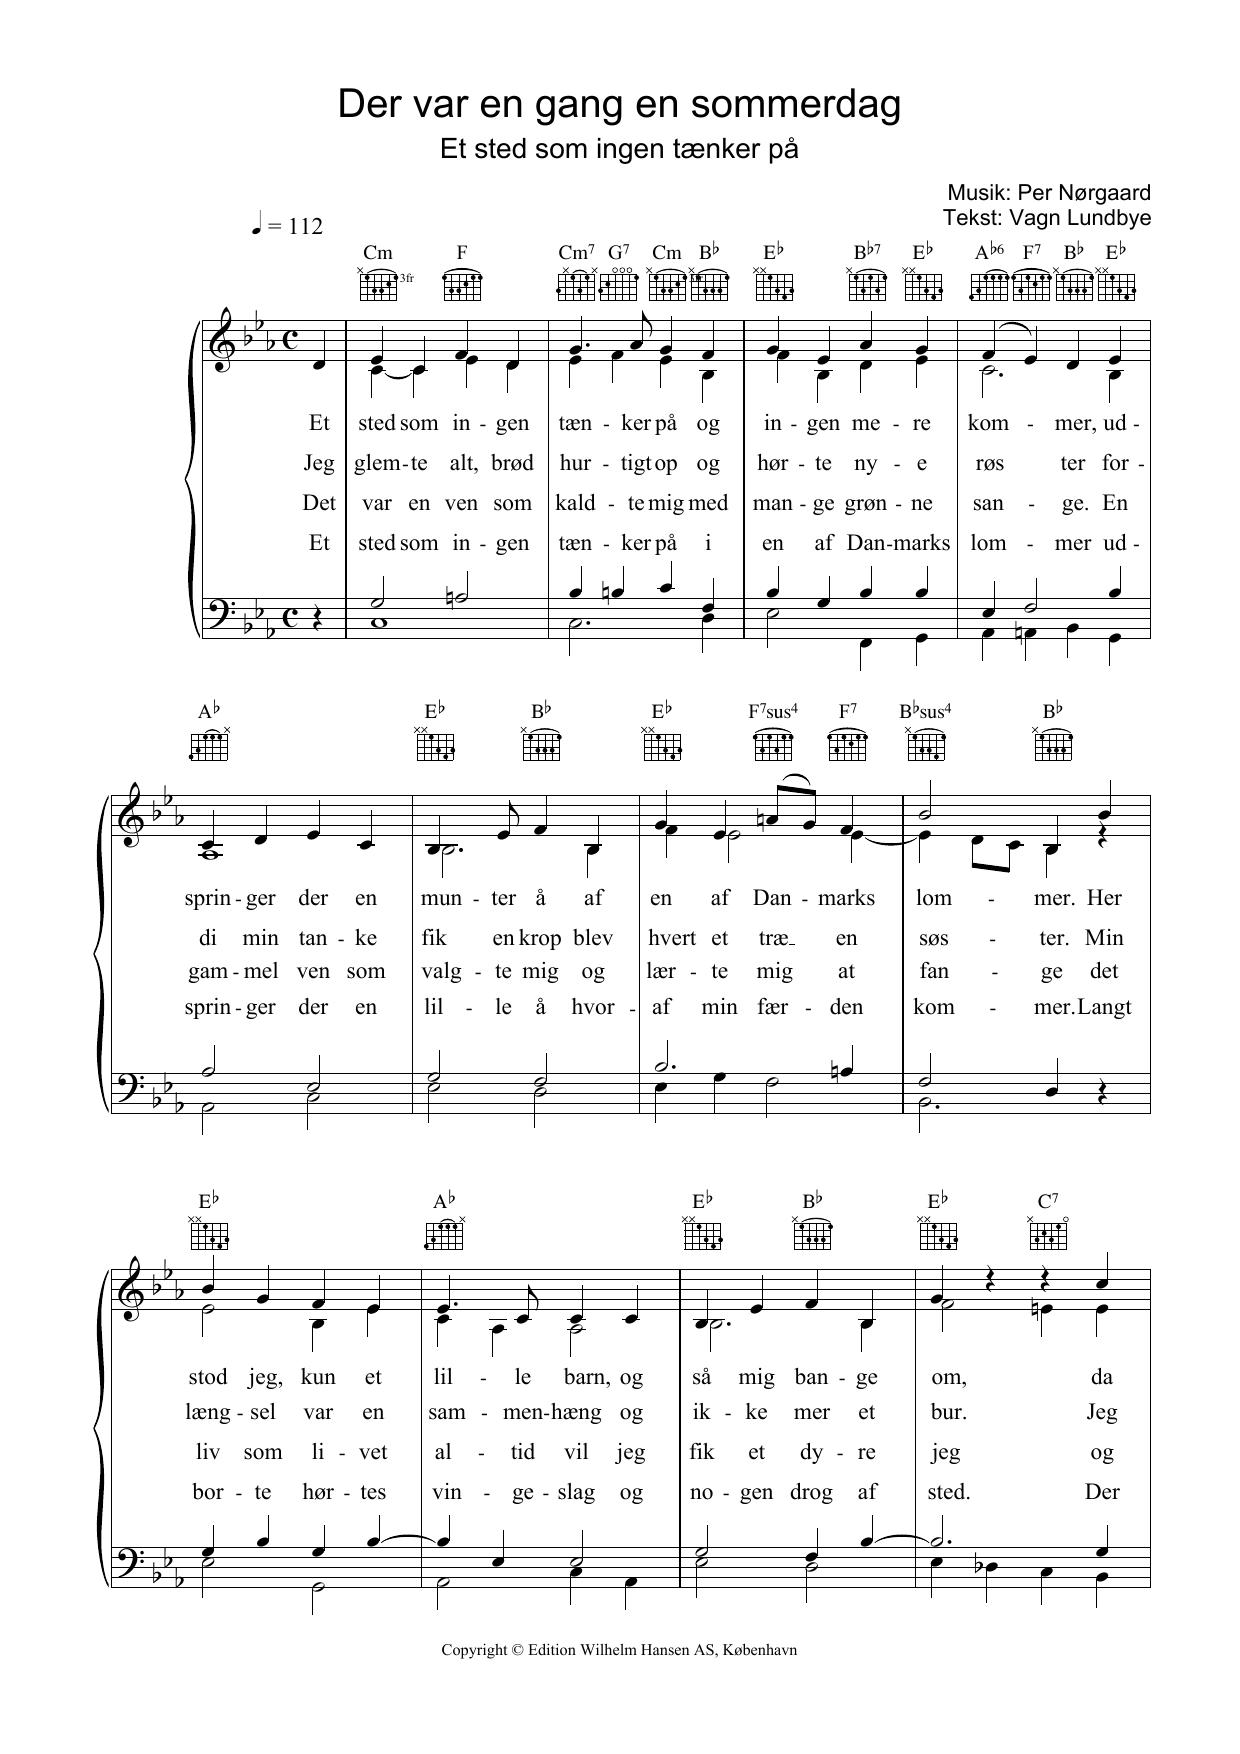 Der Var En Gang En Sommerdag sheet music